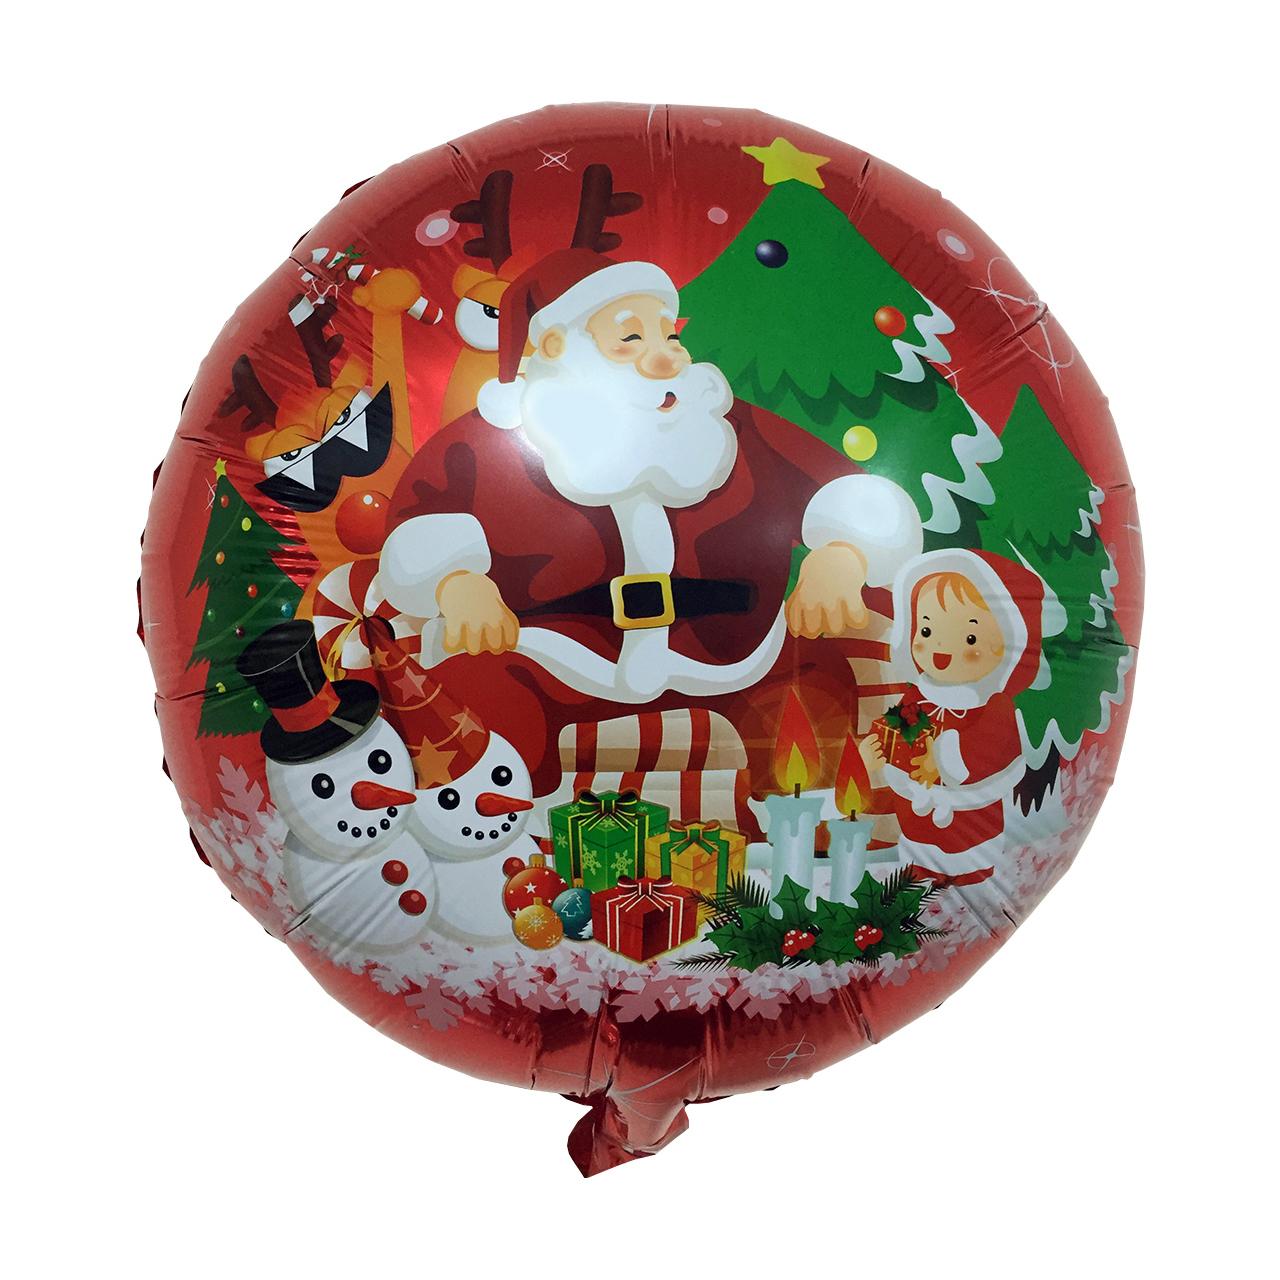 بادکنک سورتک طرح بابانوئل کریسمس مدل STCH179